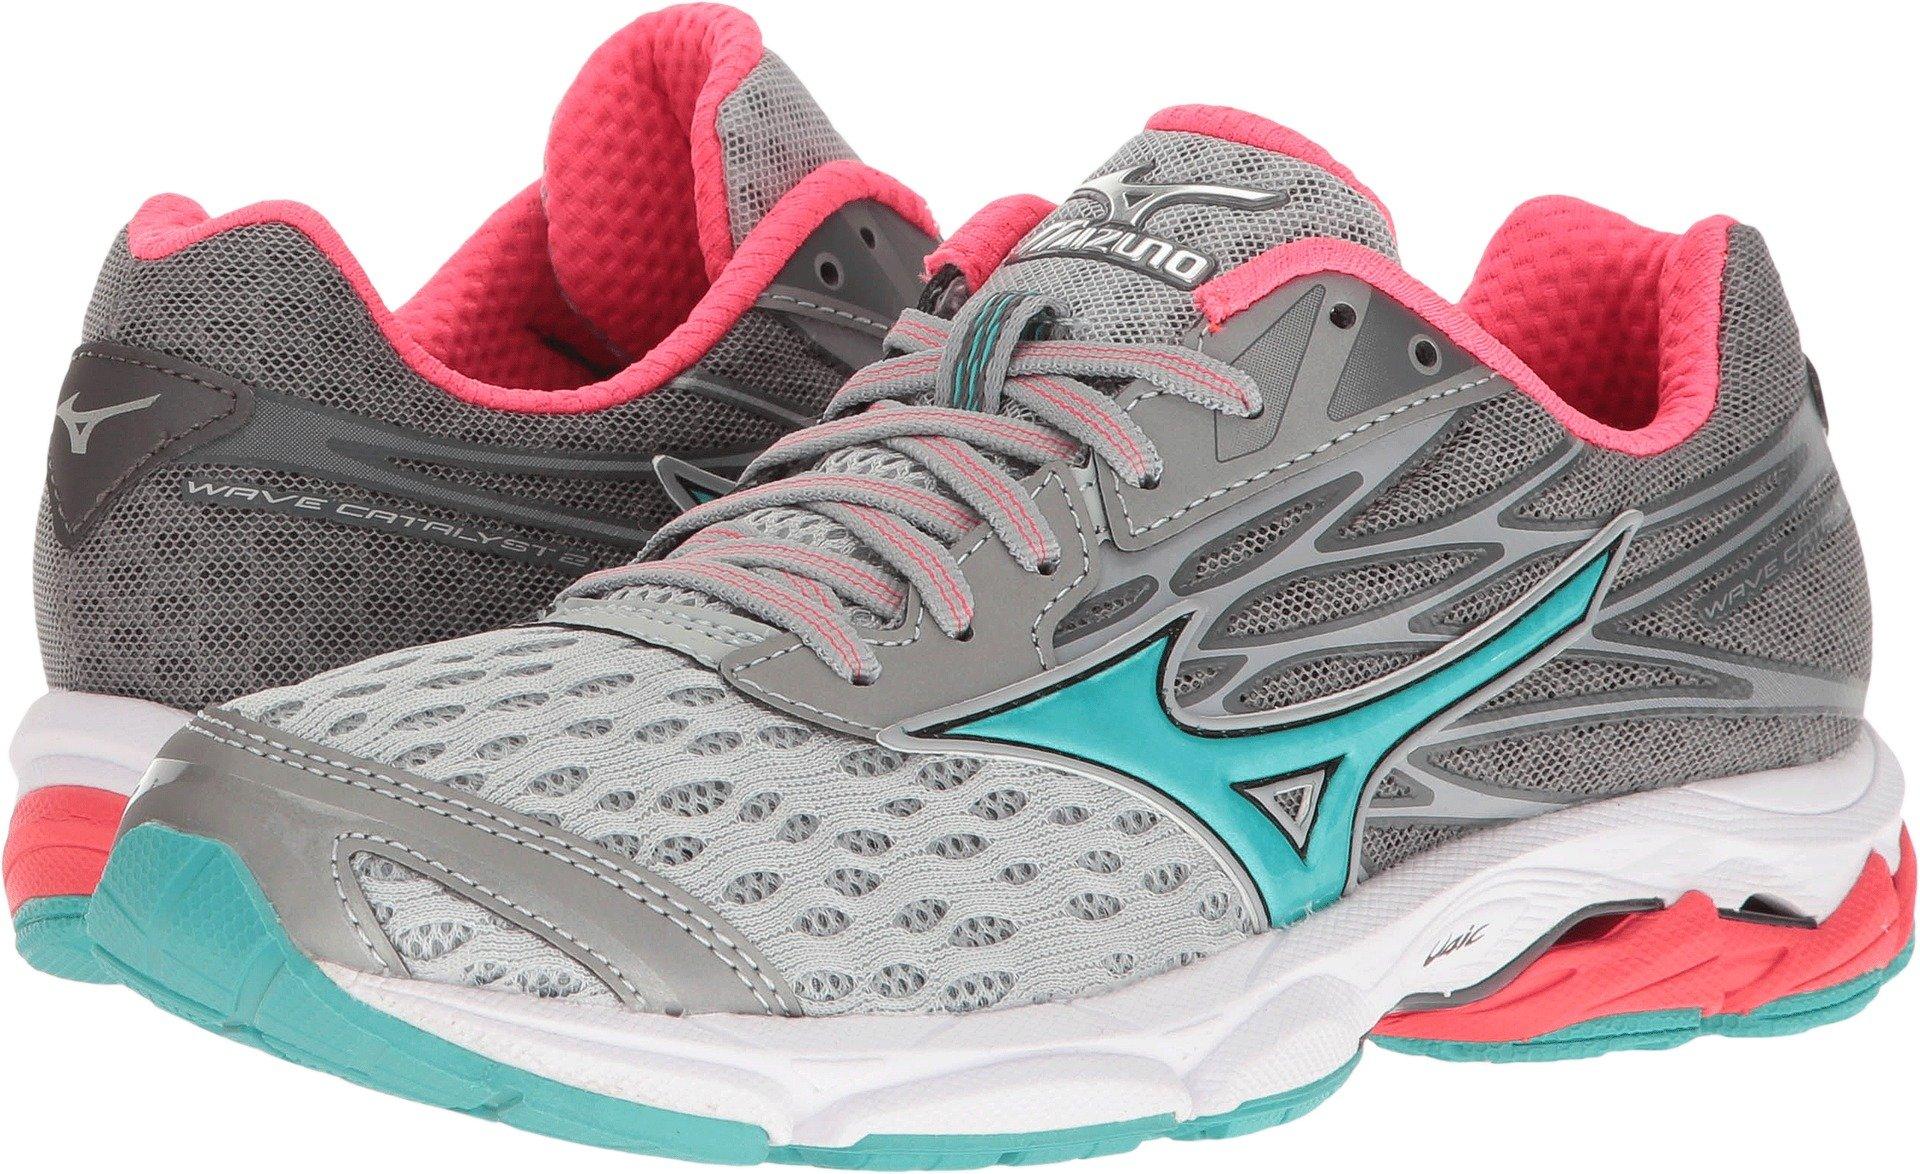 Mizuno Women's Wave Catalyst 2 Running Shoe, Grey/Mint, 8 B US